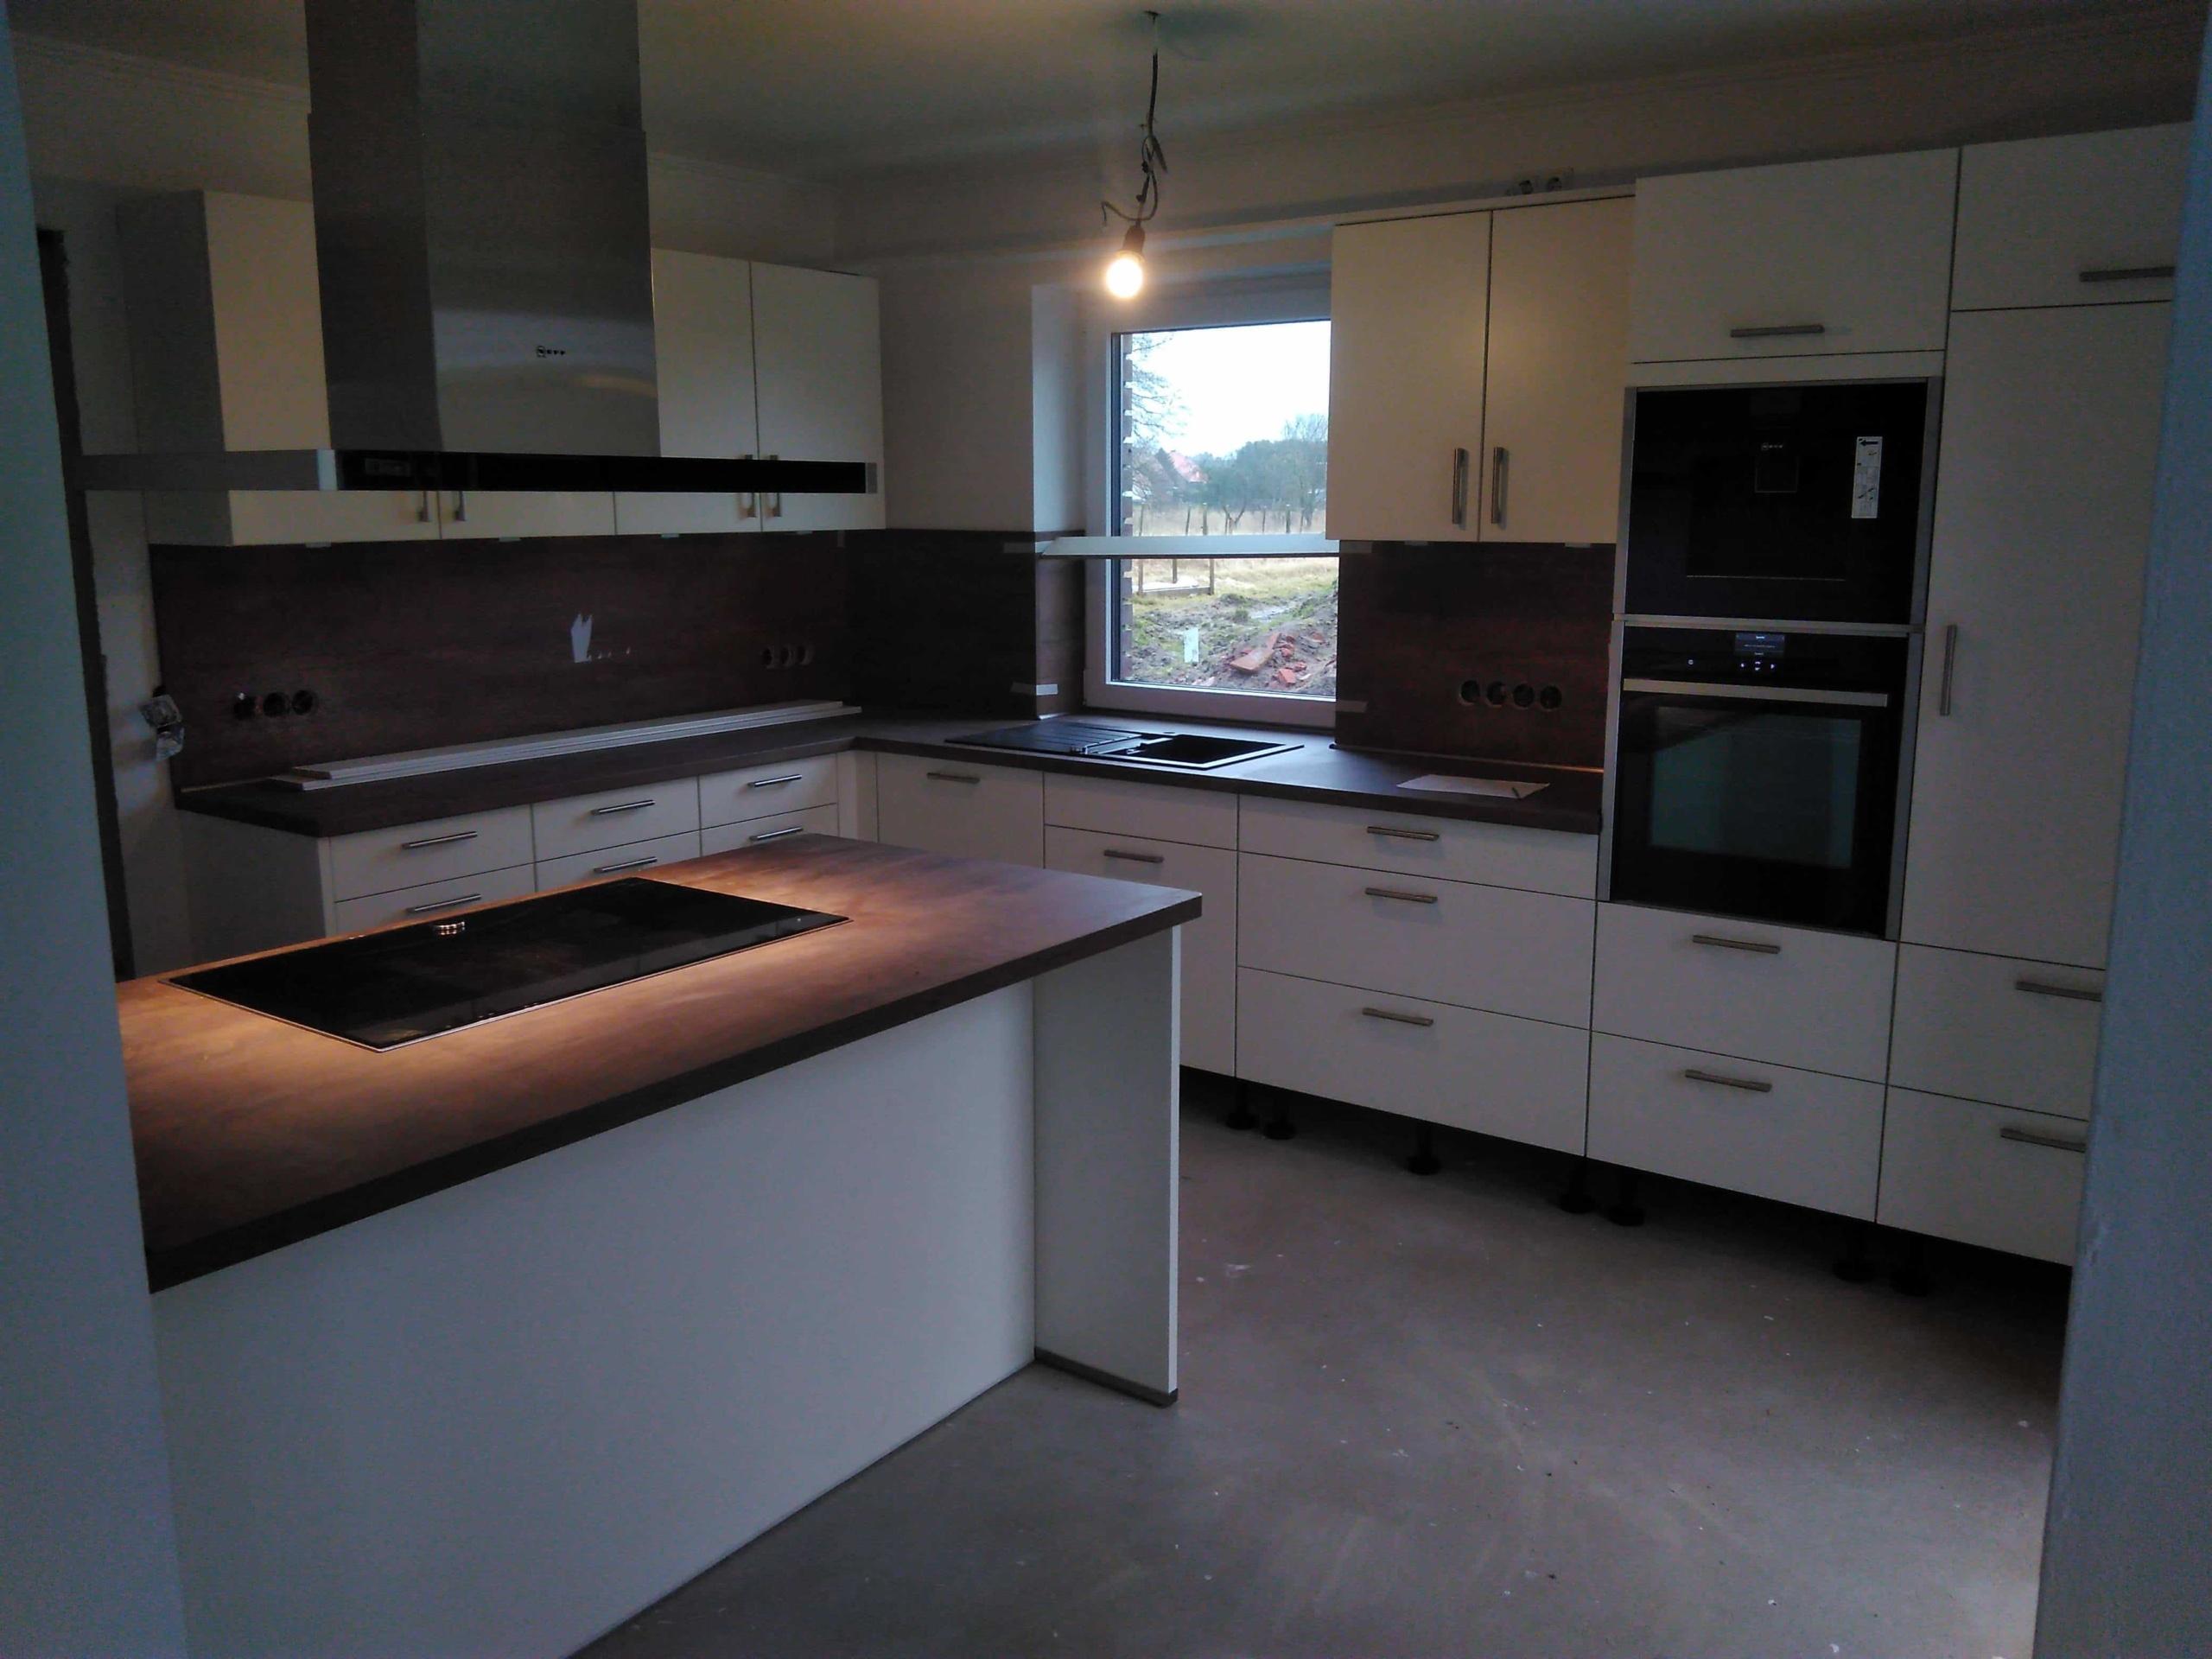 Winkelküche mit Kochinsel